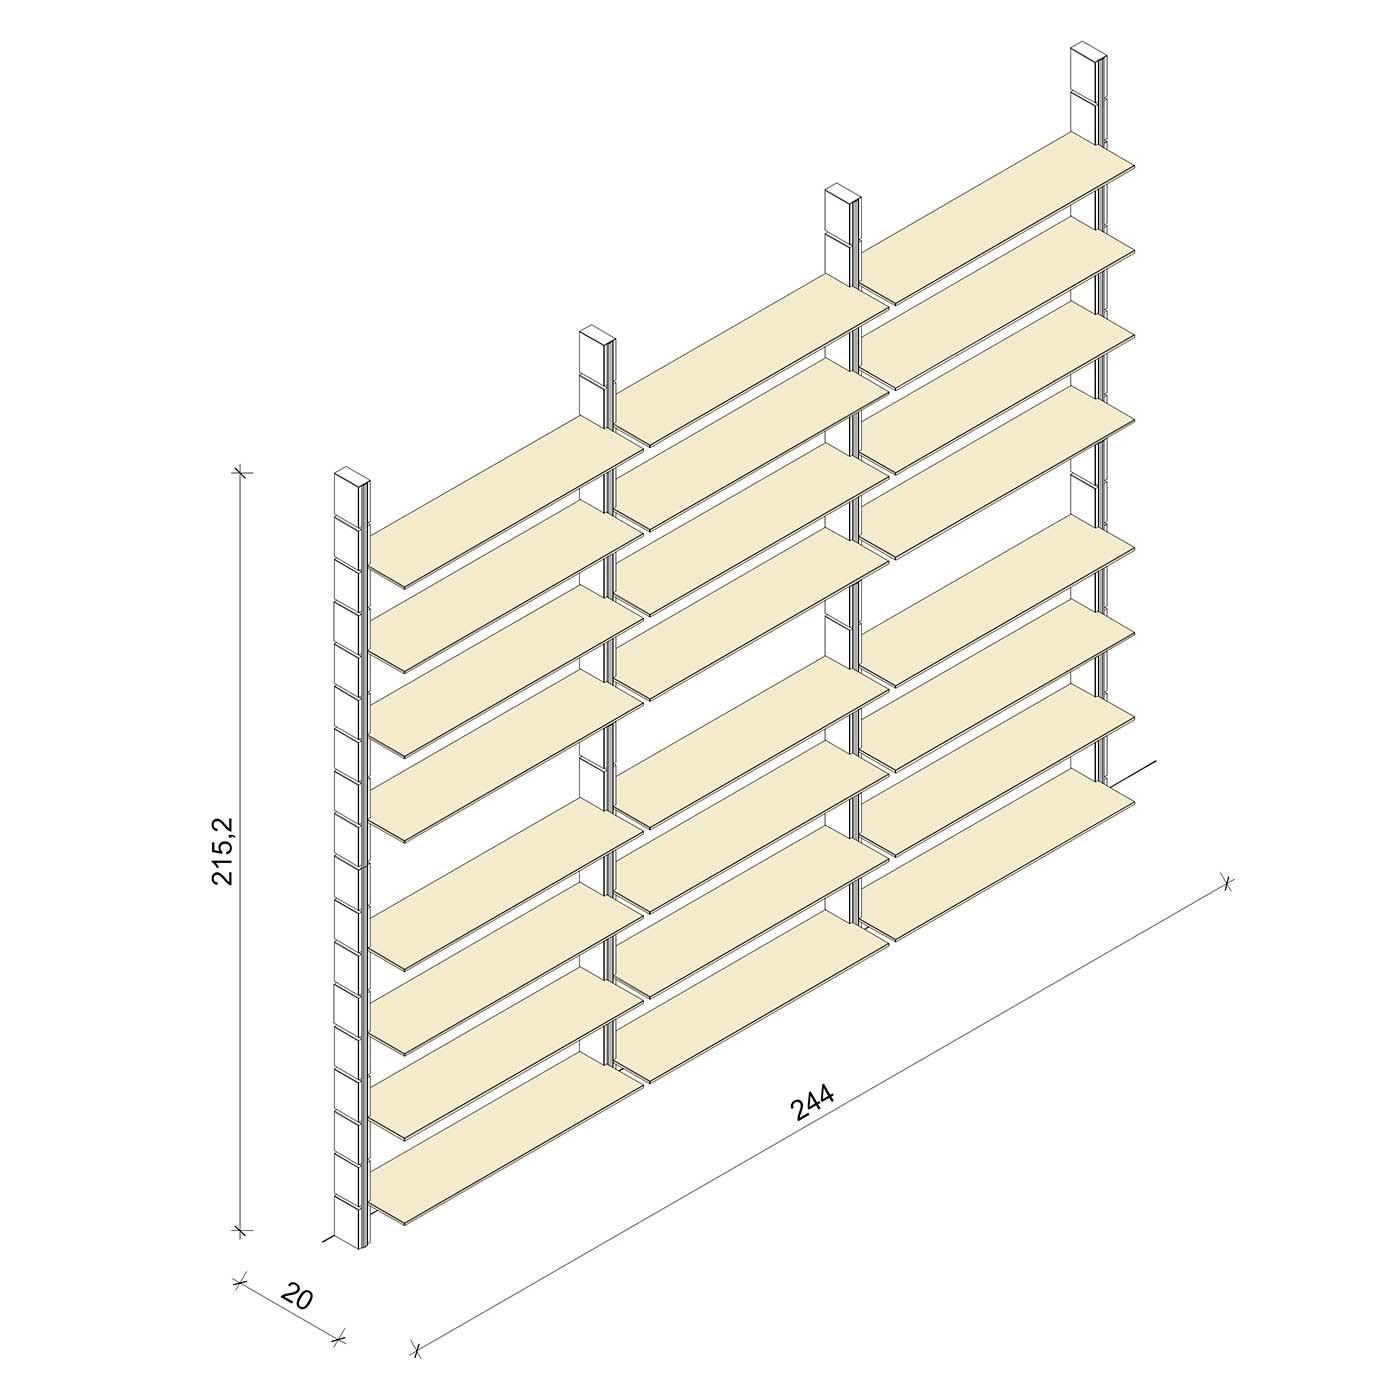 Bücherregal - Classic (XL) 244 - Maß: 244 x 215,2 x 20 cm (B x H x T)